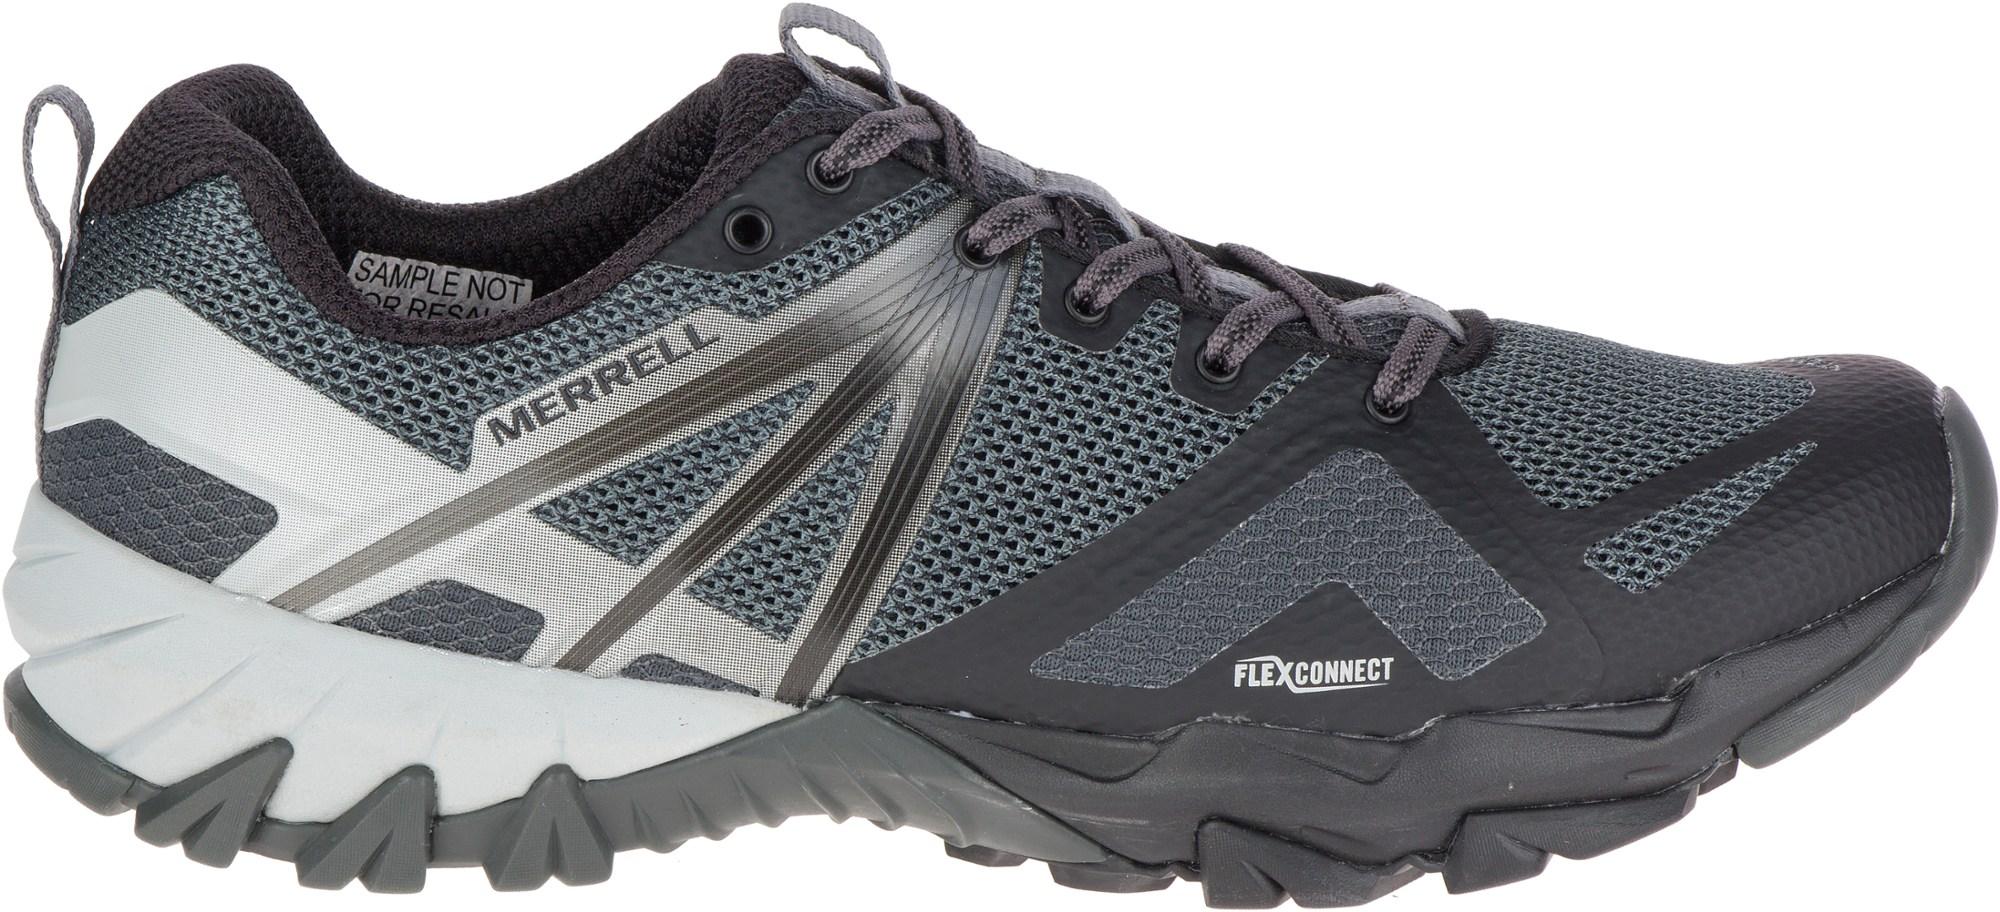 Merrell MQM Flex Hiking Shoes